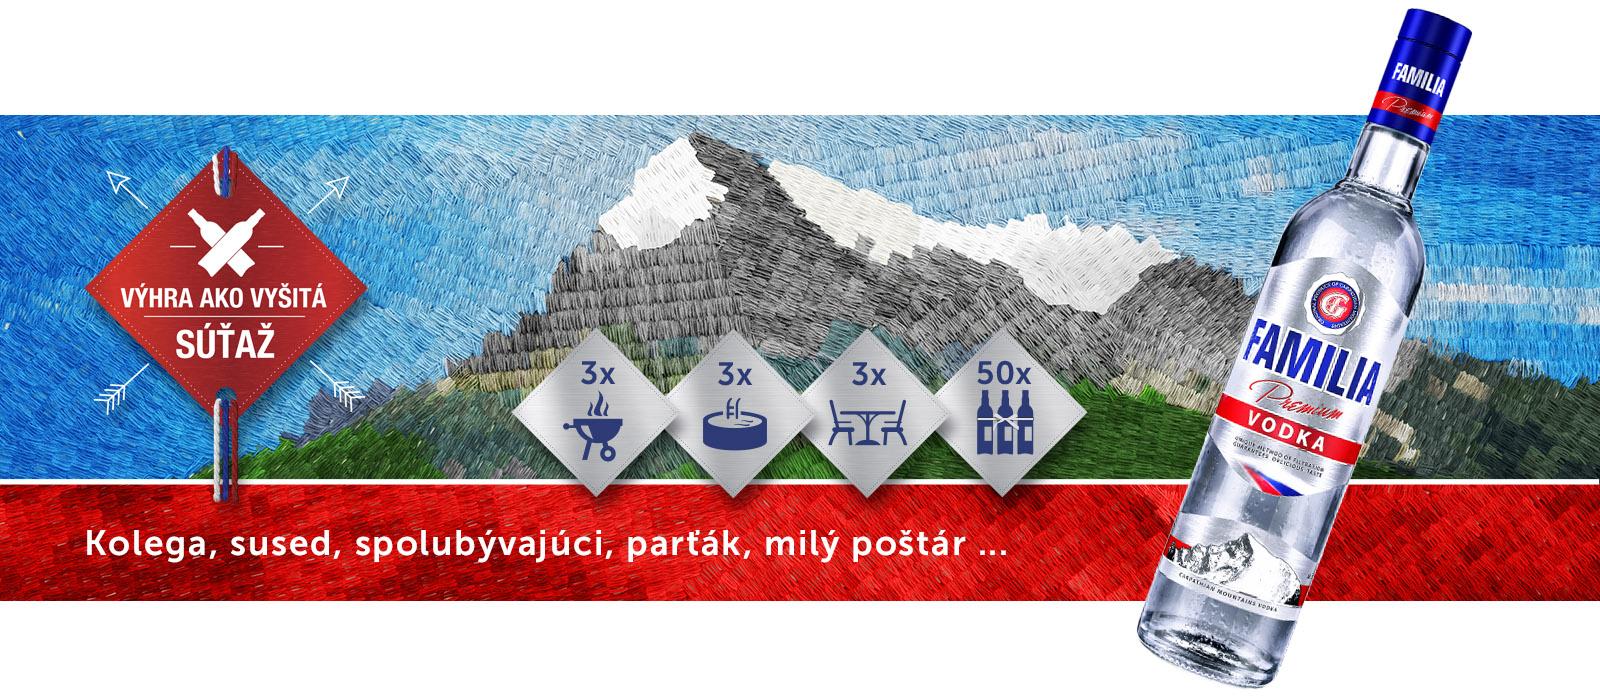 FP_vyhra_1600x700